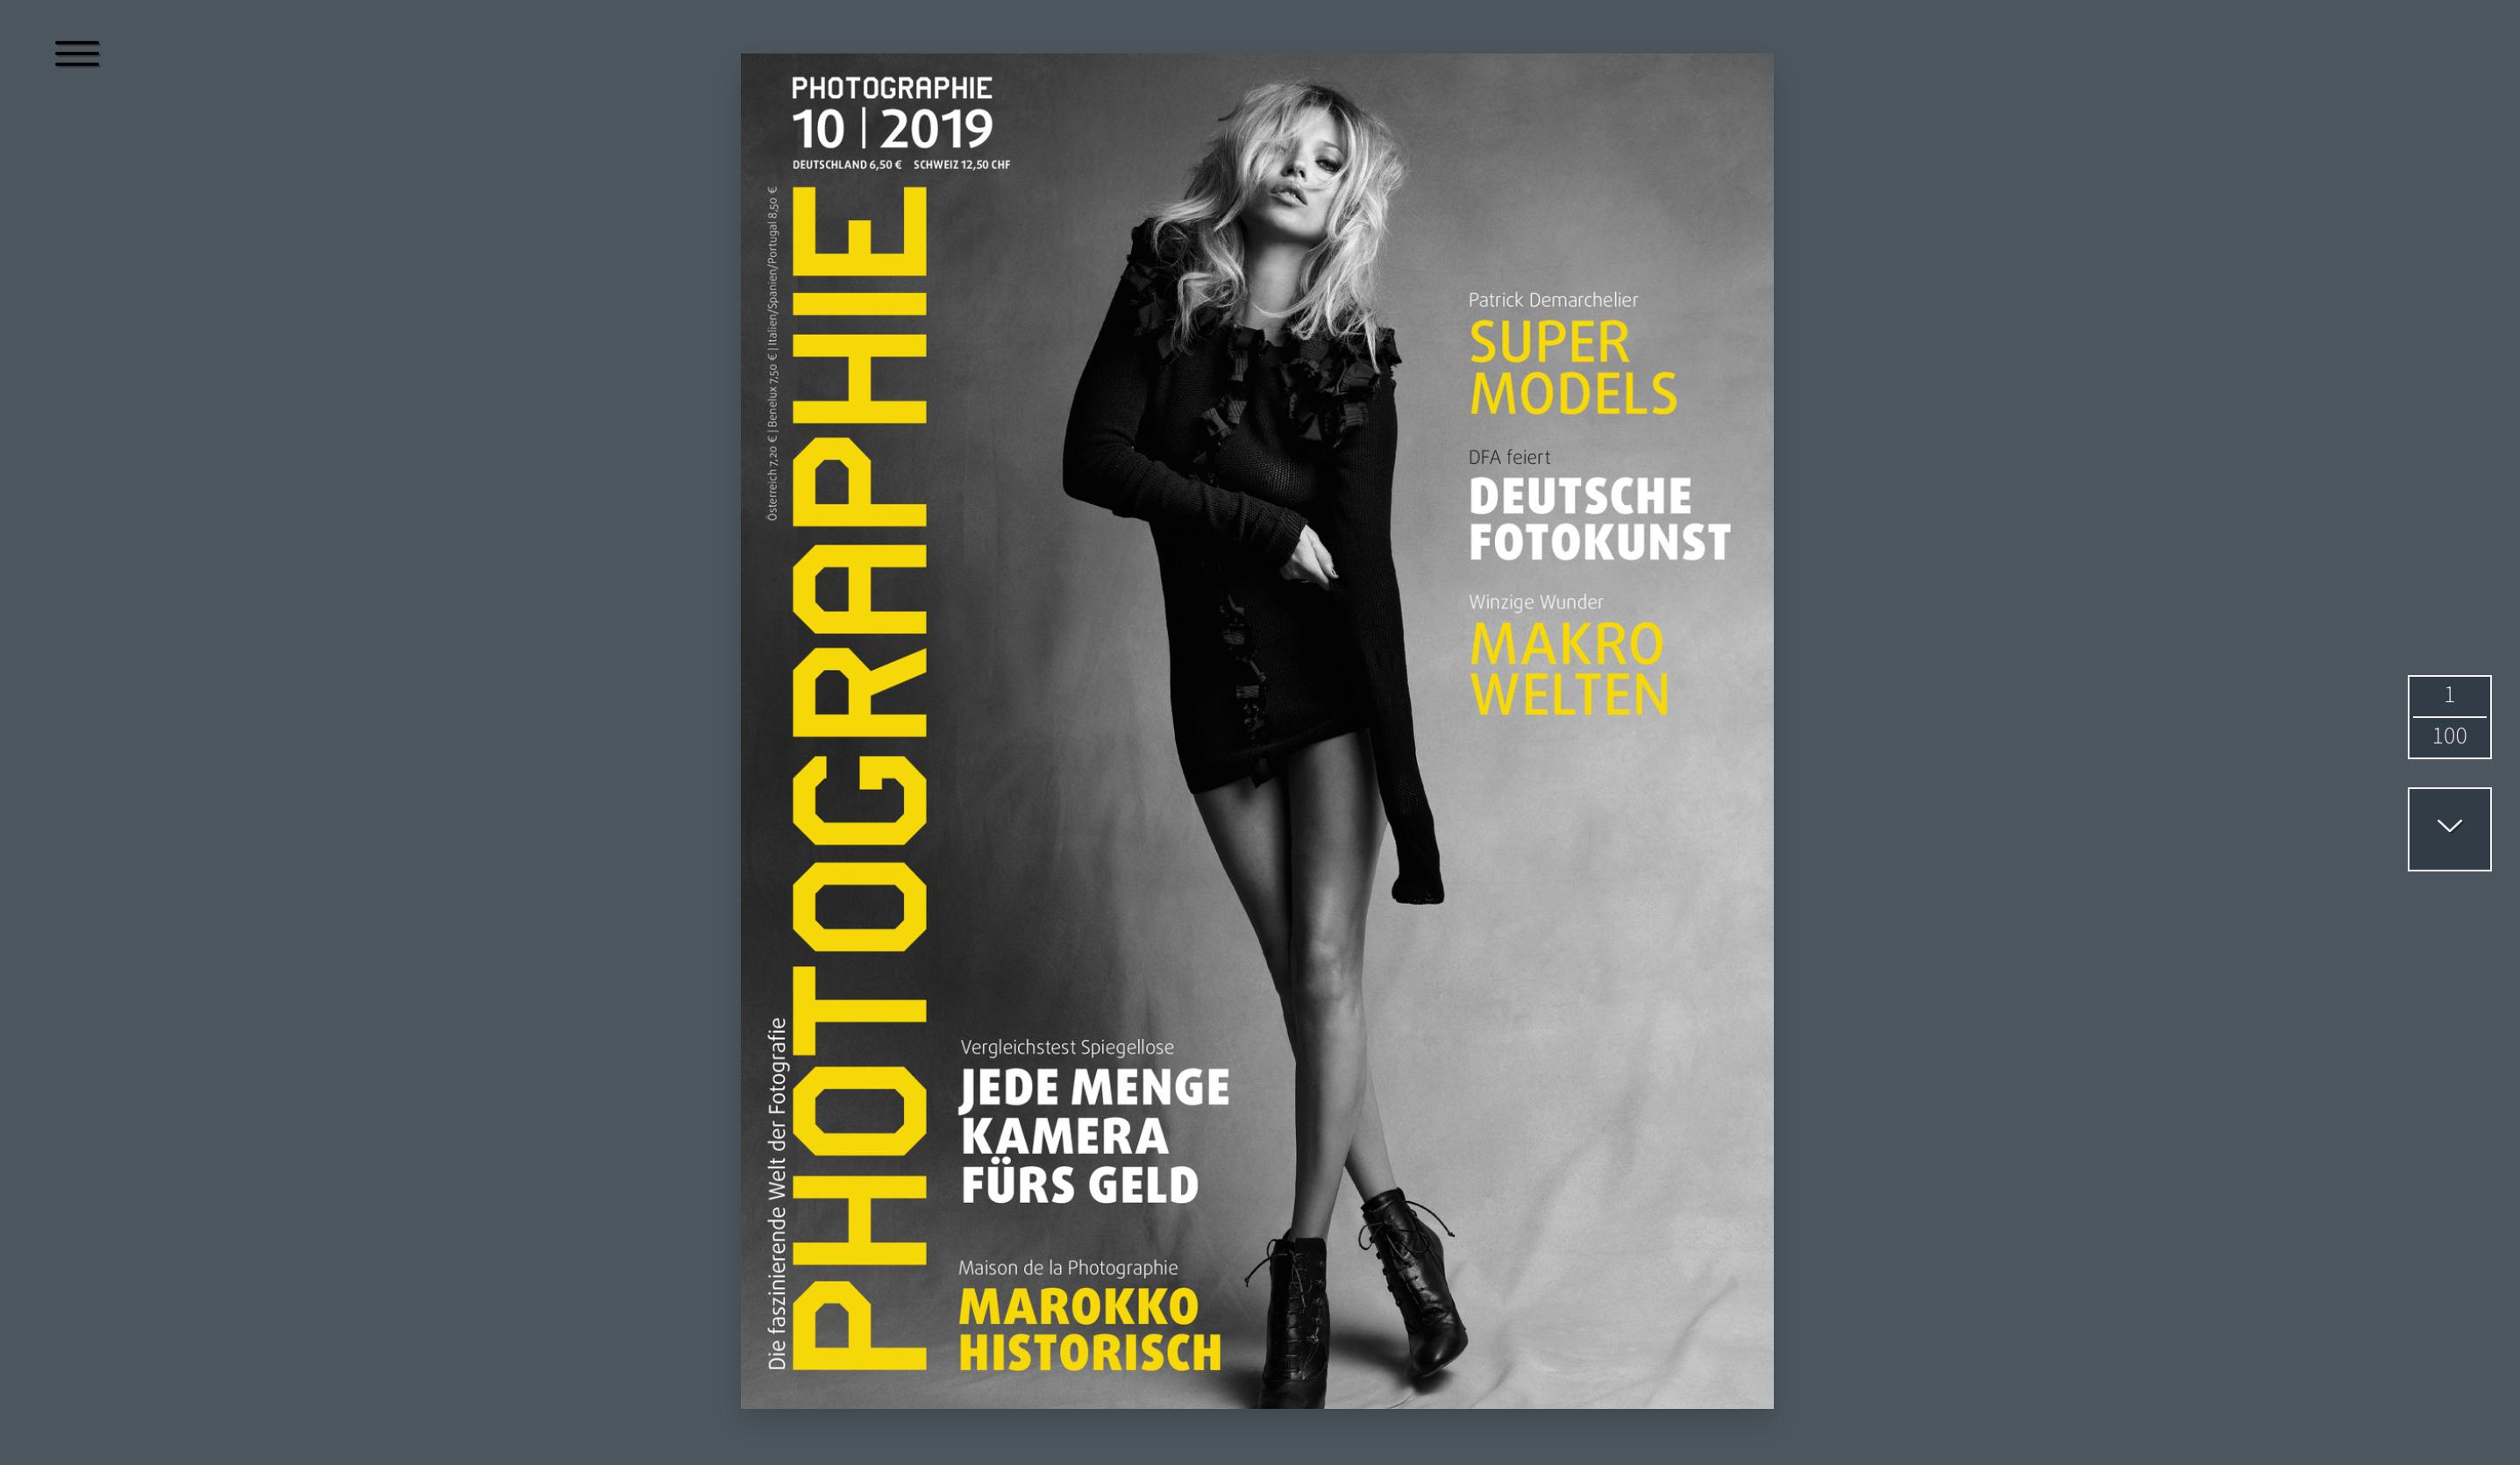 PHOTOGRAPHIE 10 | 2019